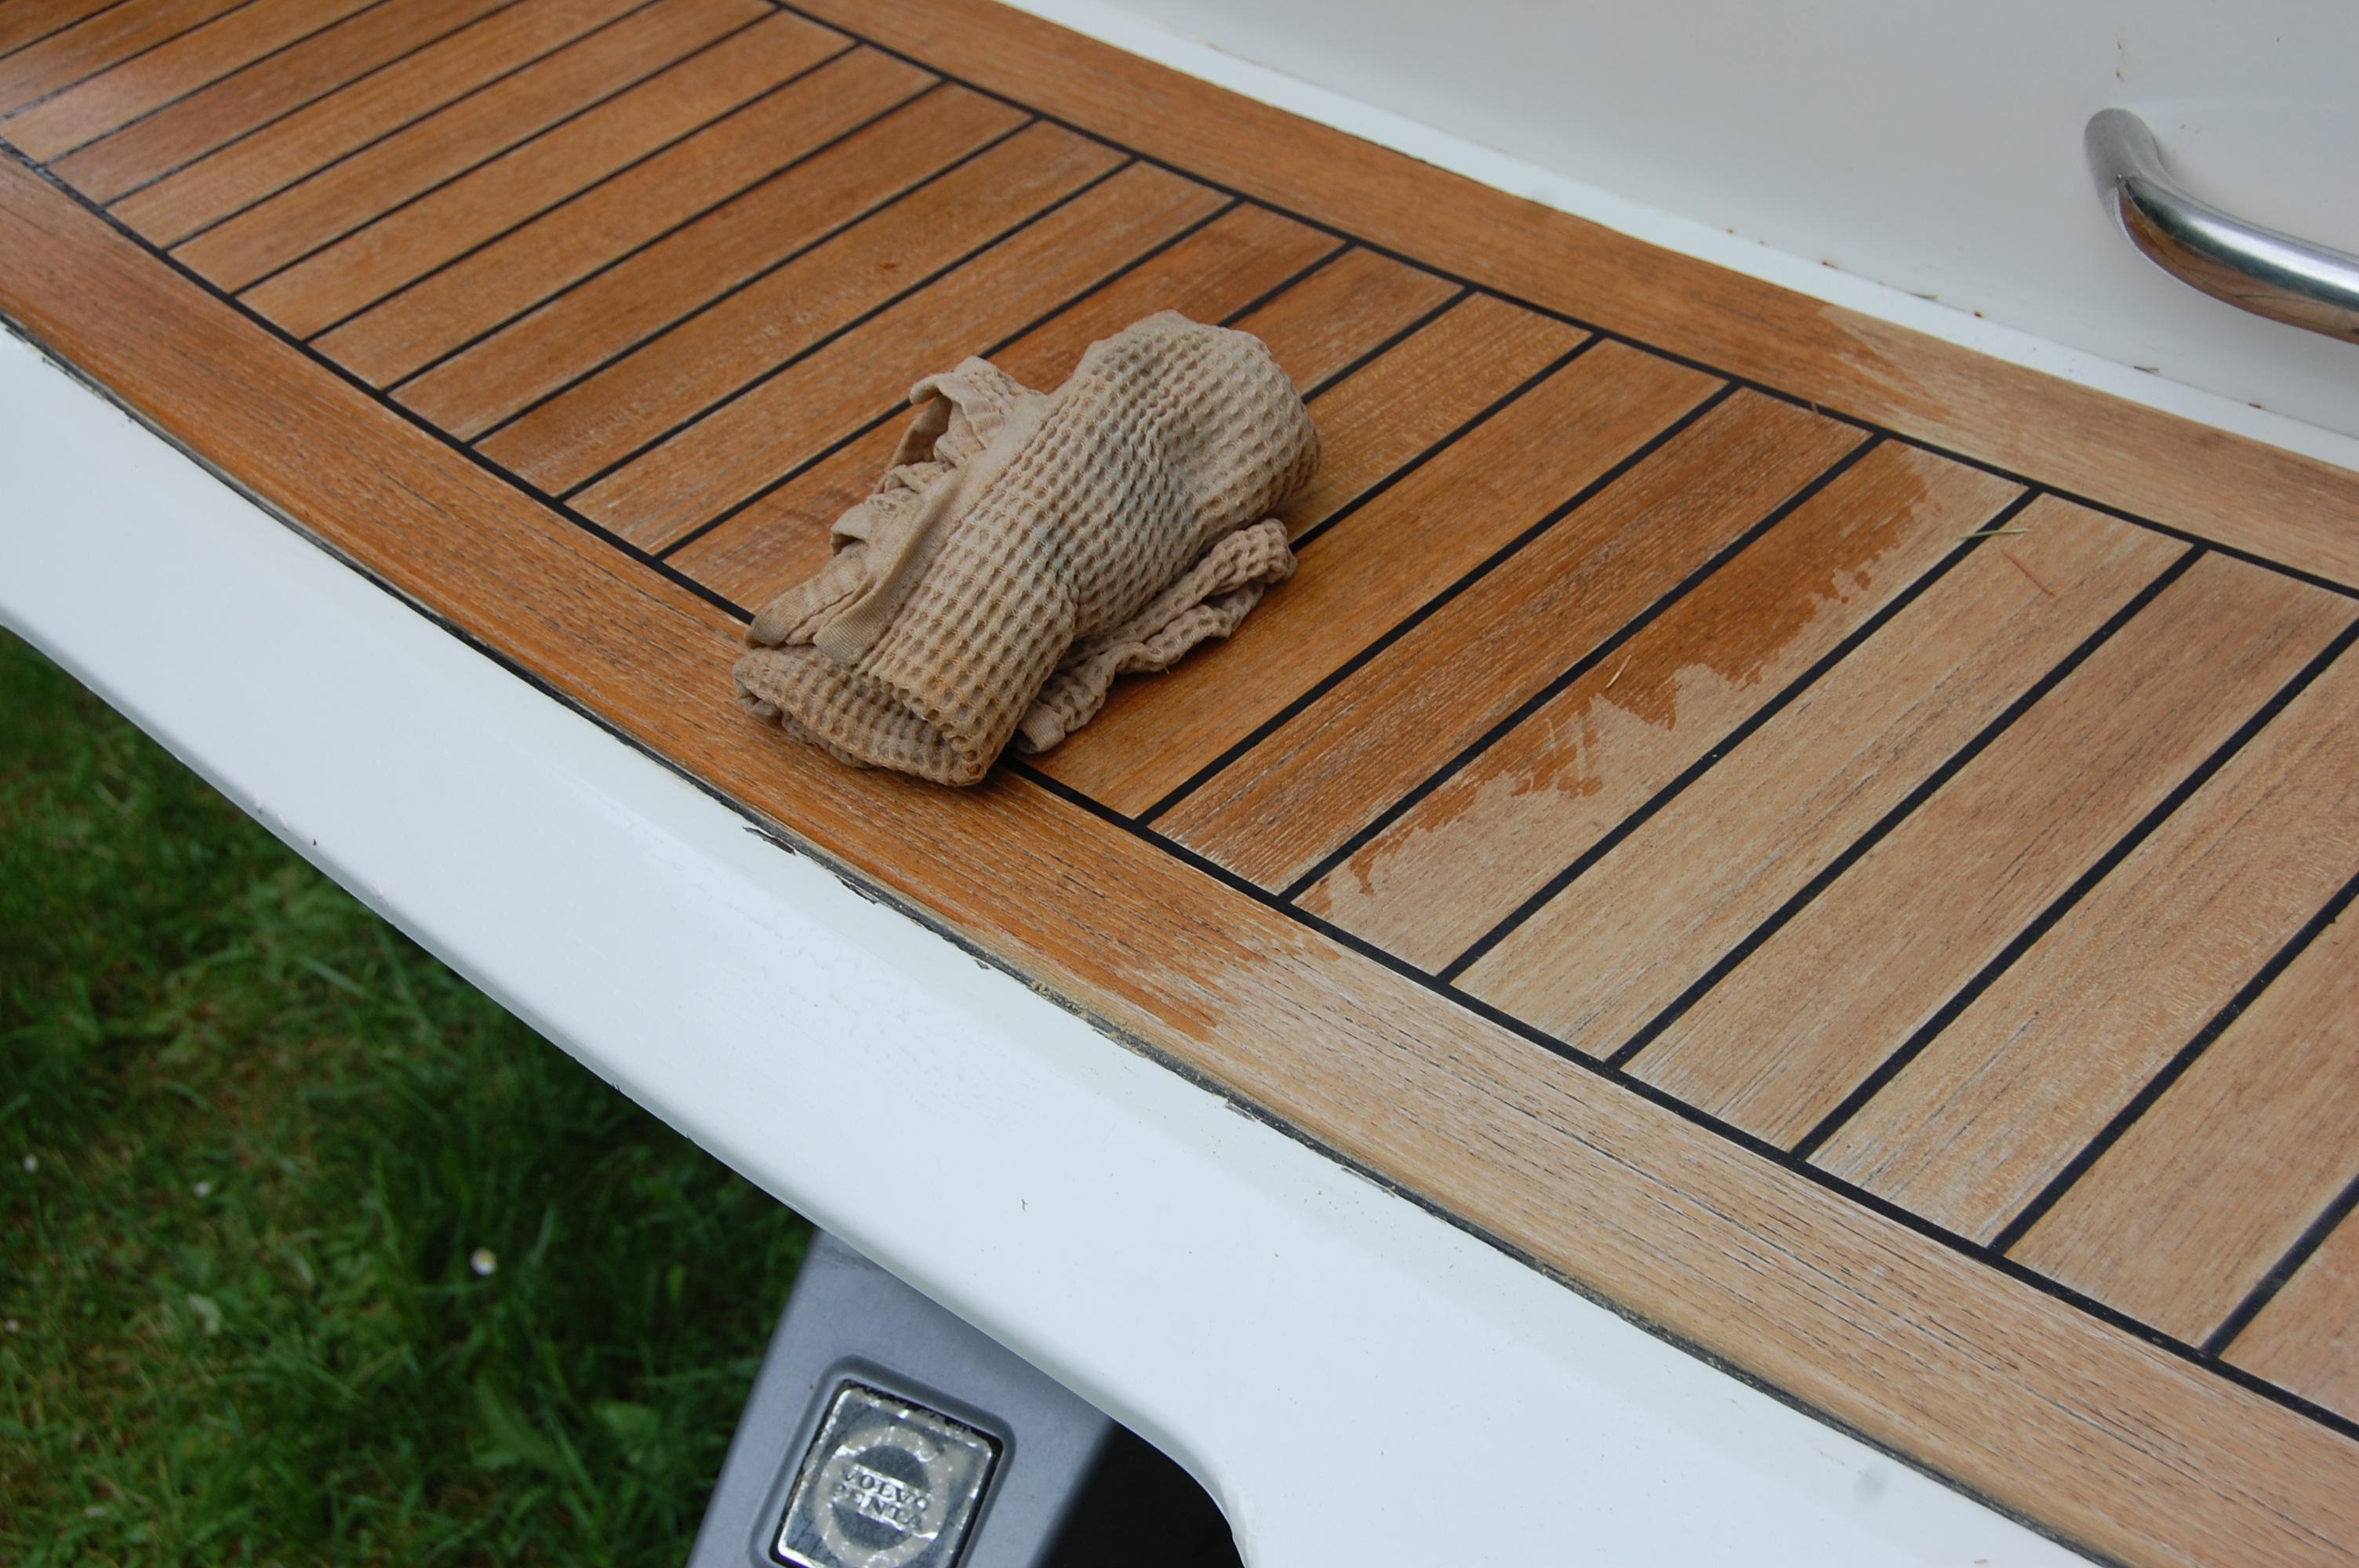 Wood restoration - step 10